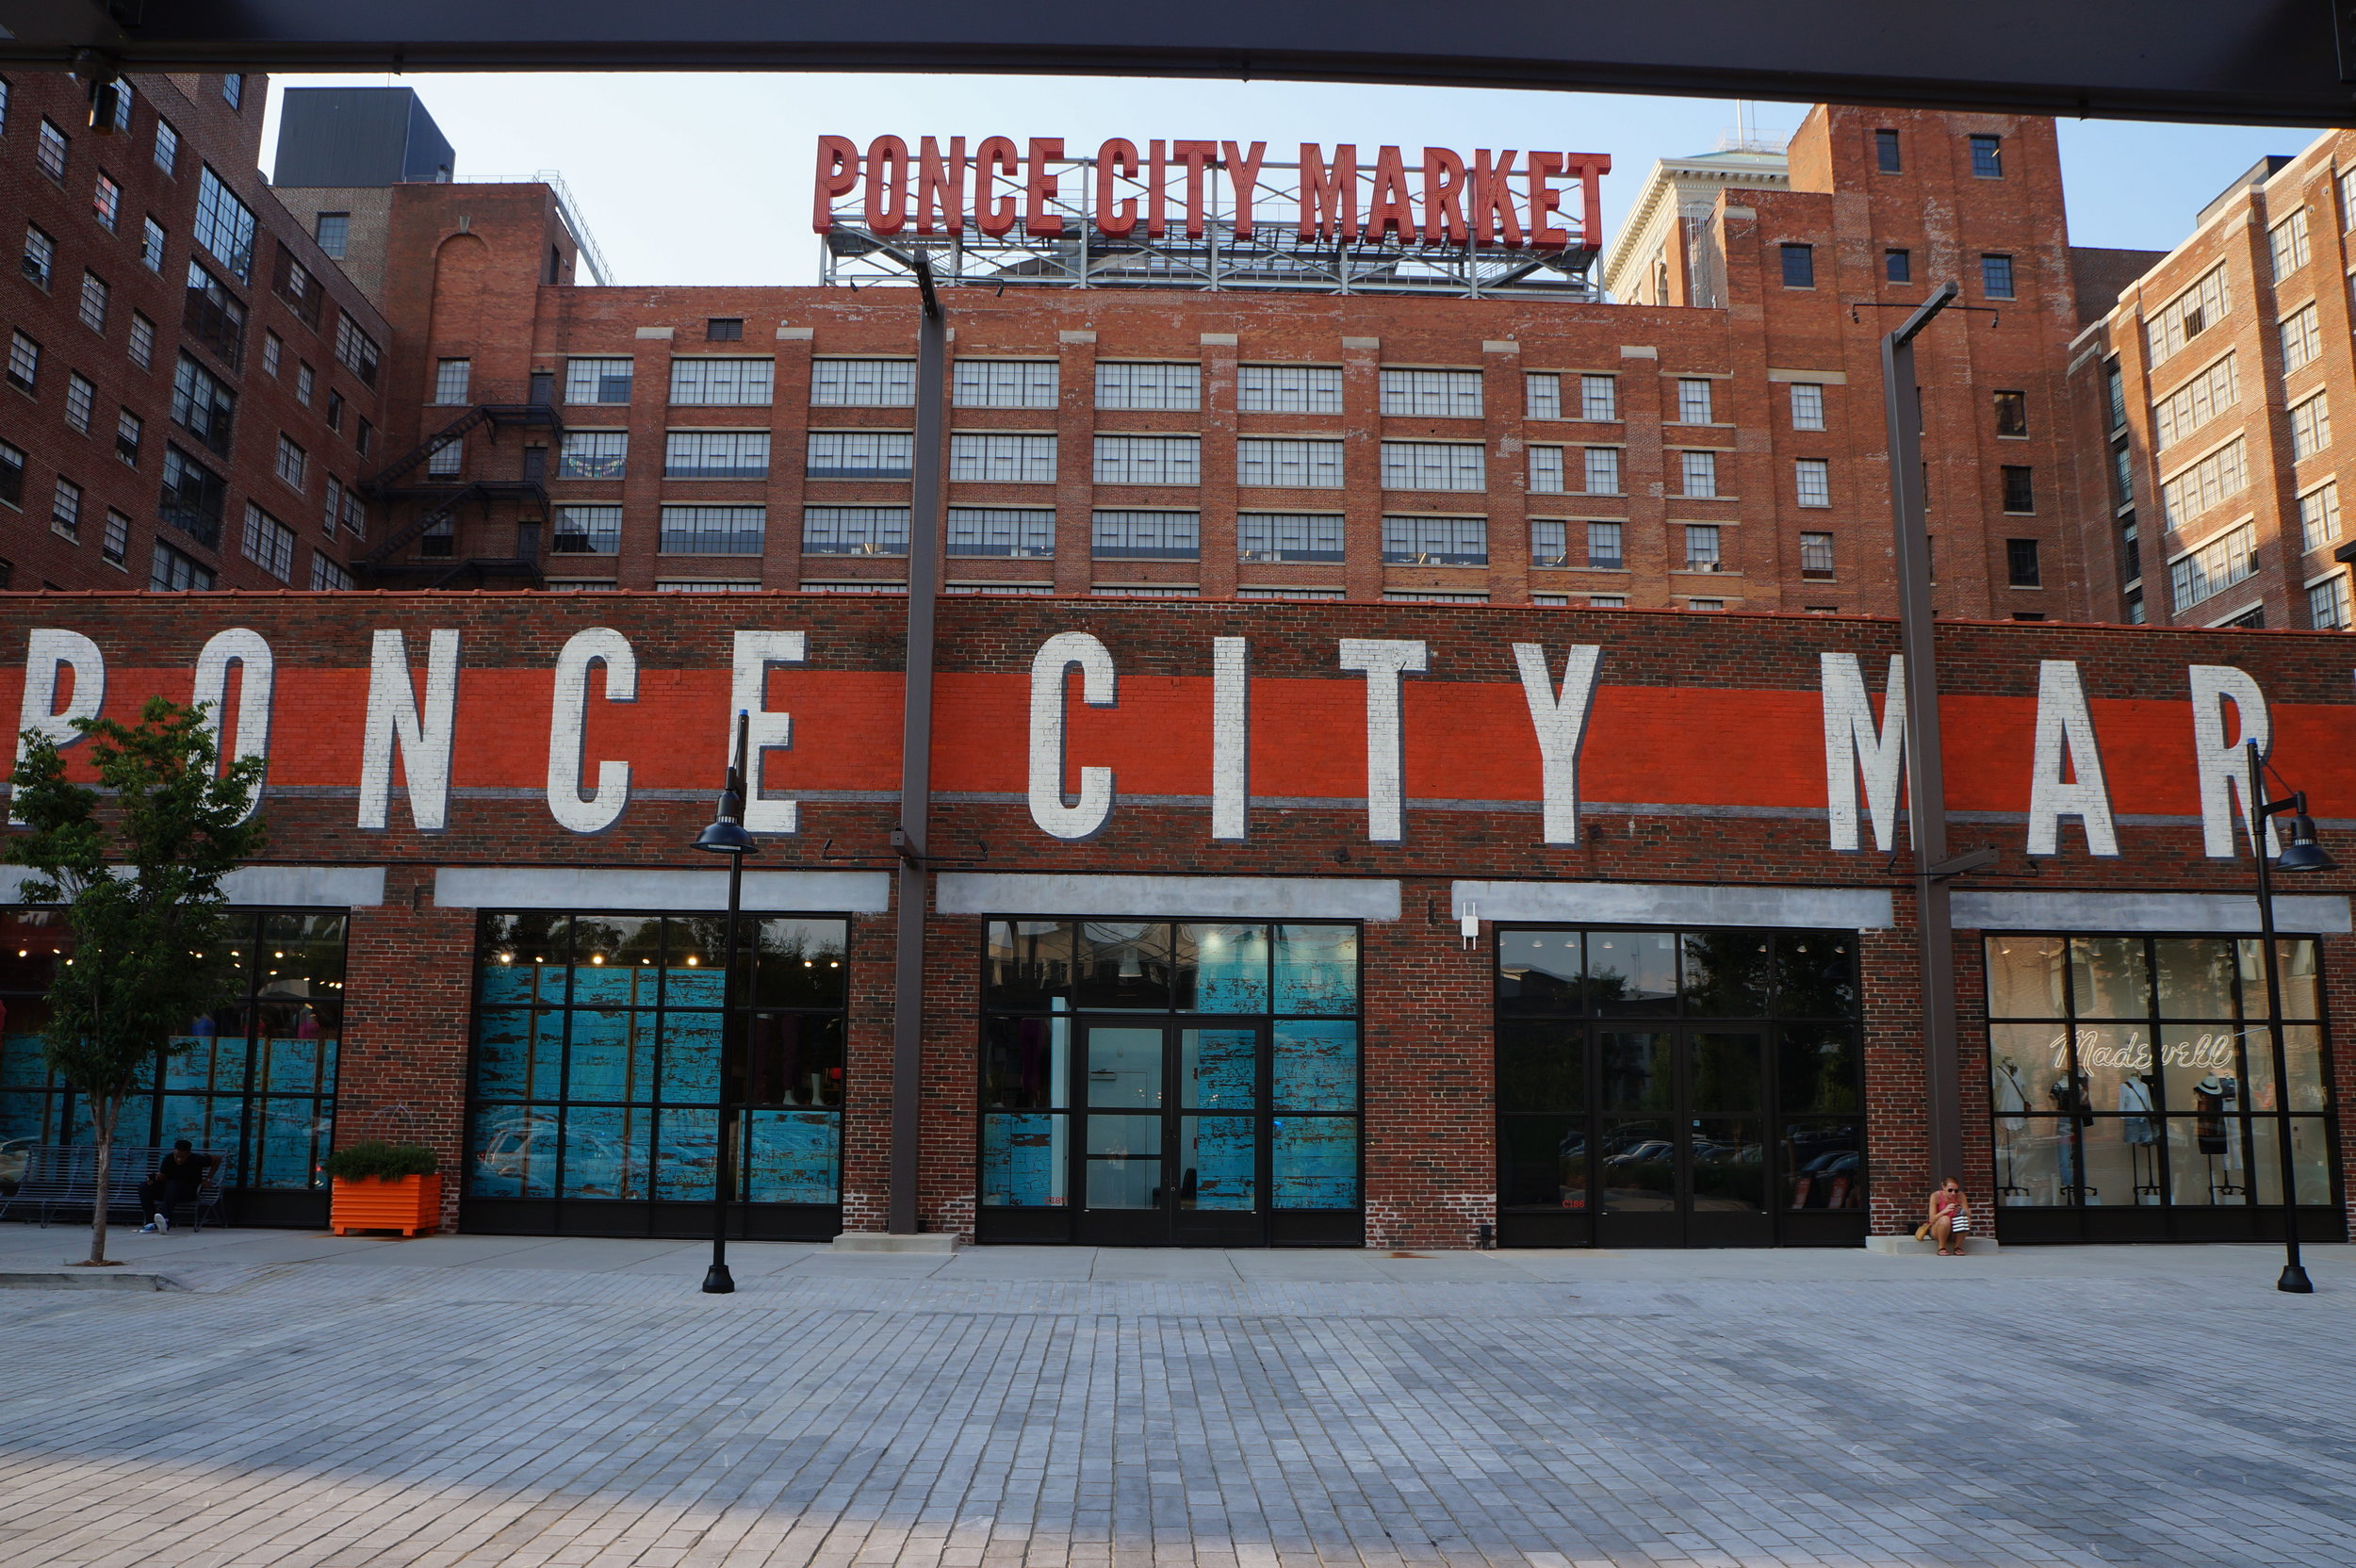 Andrea Fenise traveling blogger visits Ponce City Market Atlanta